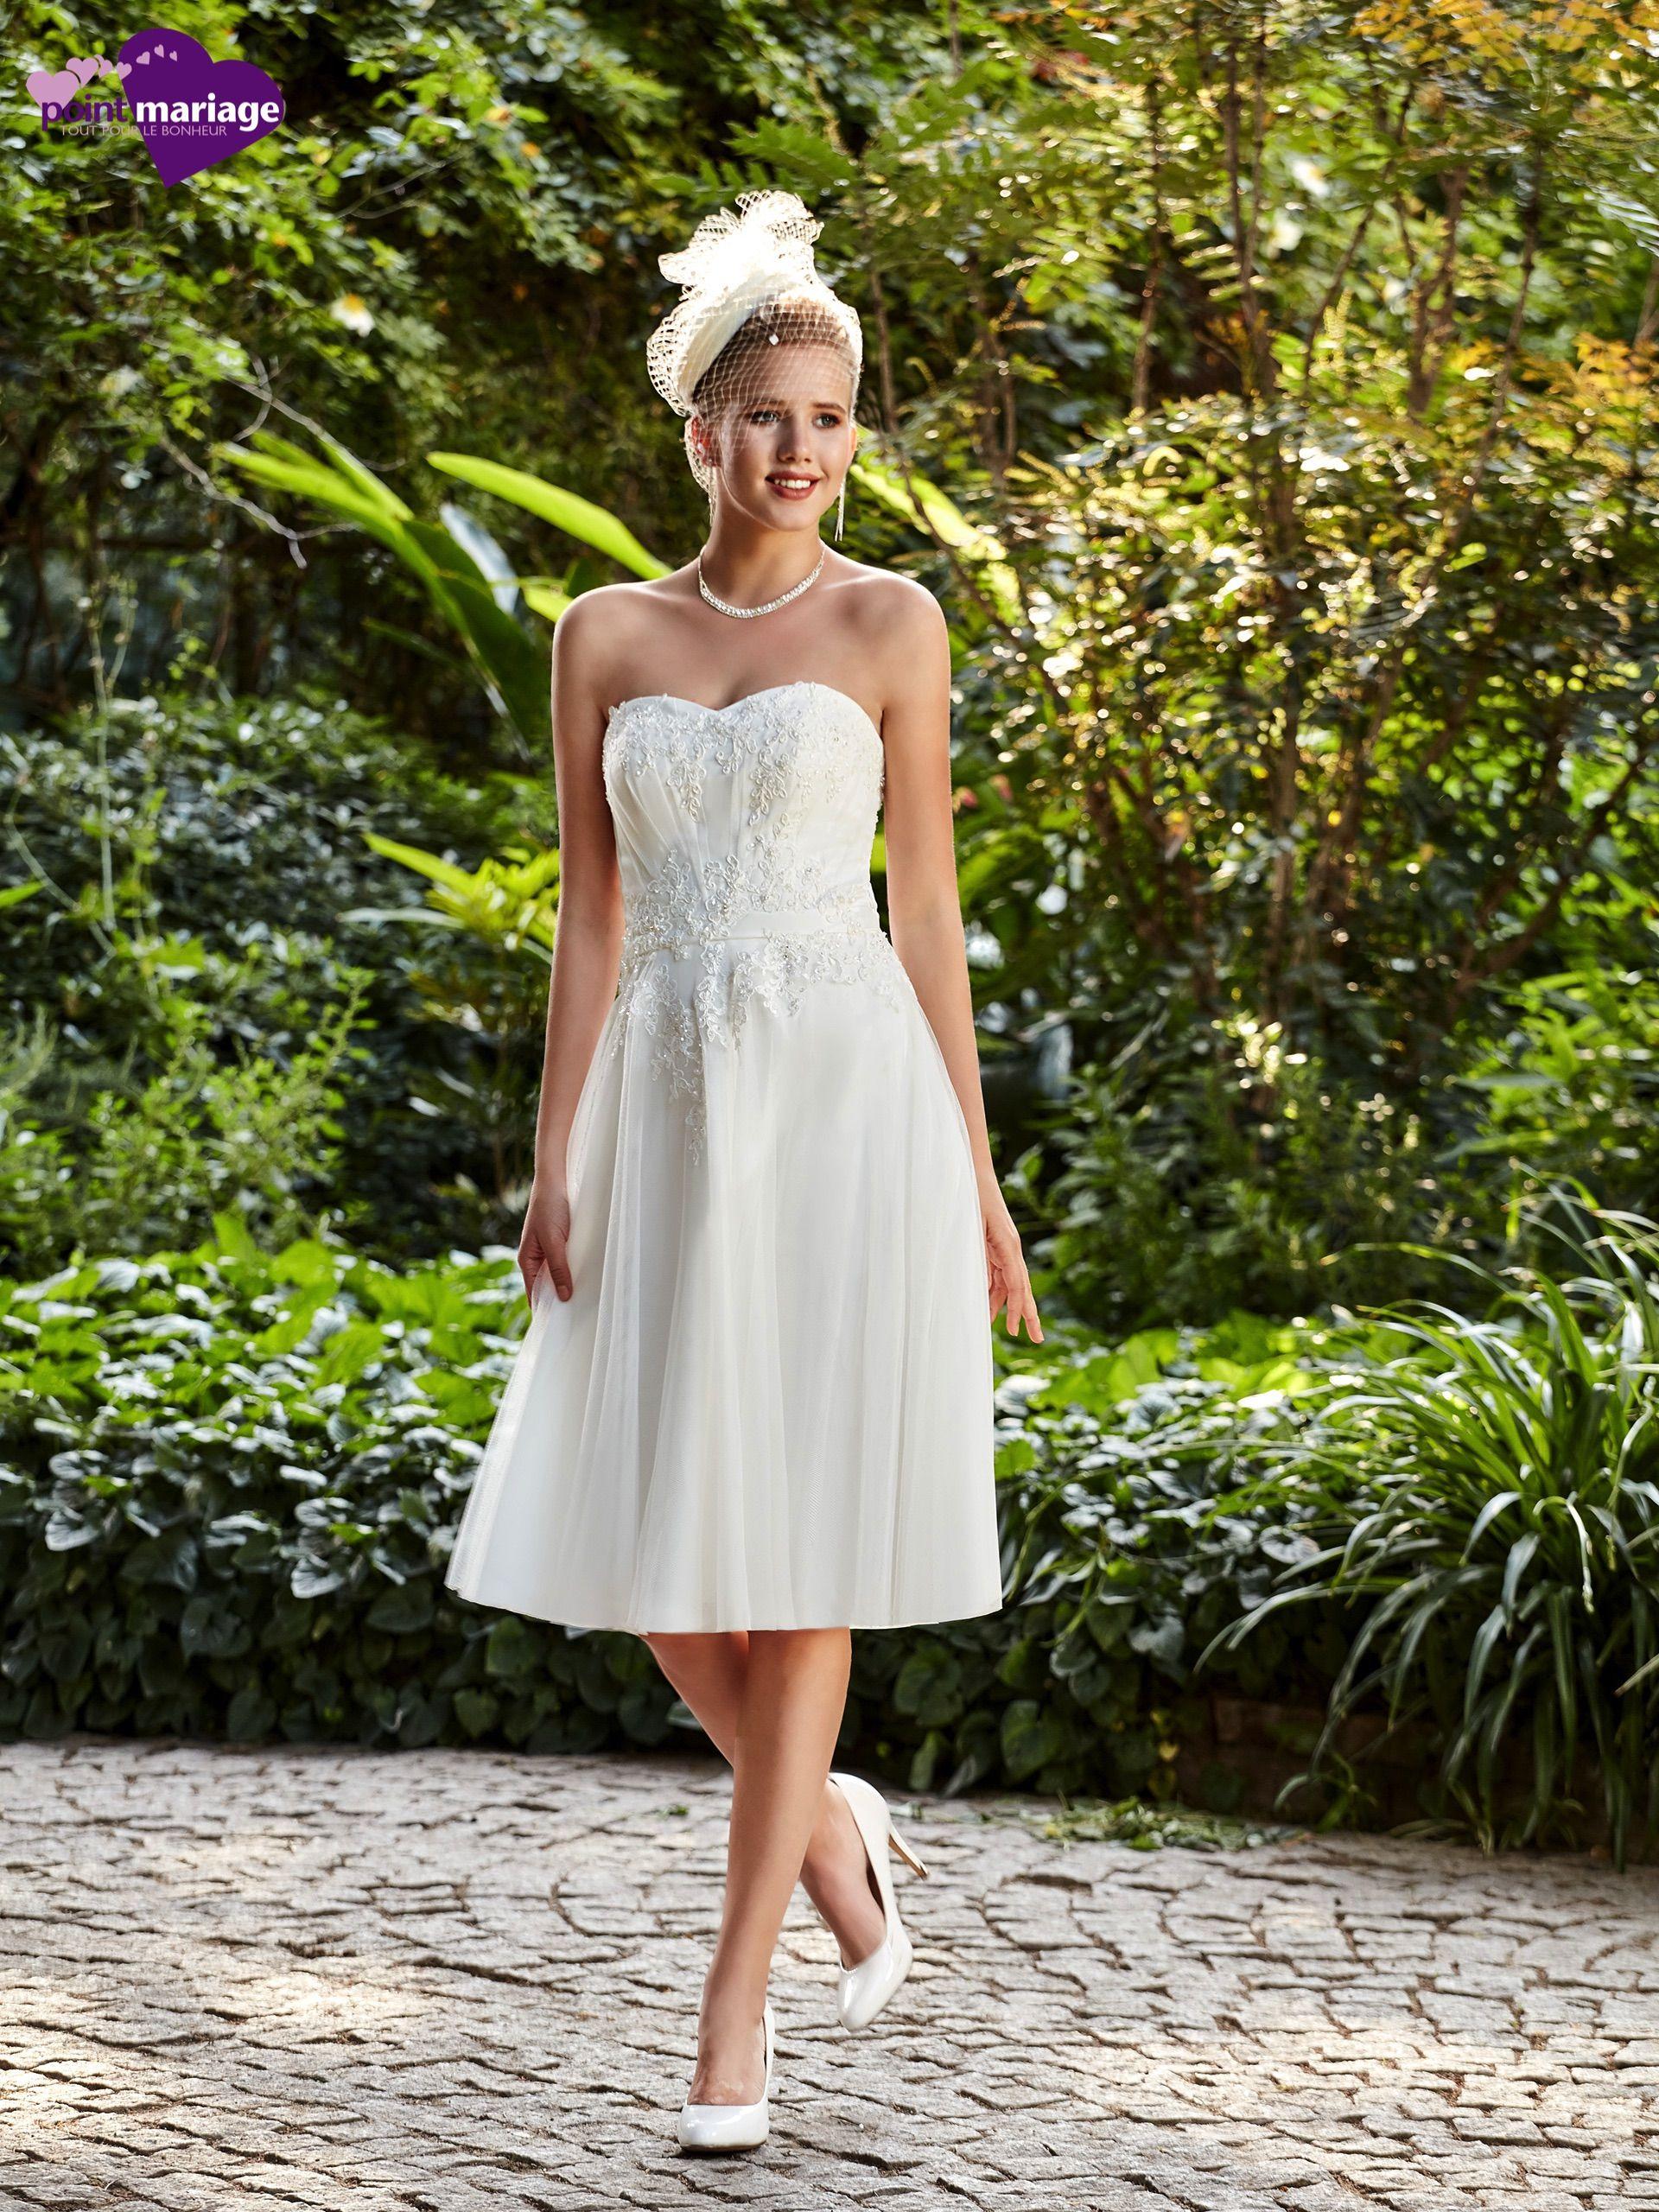 Robe mariage civil, robe de mariée courte,